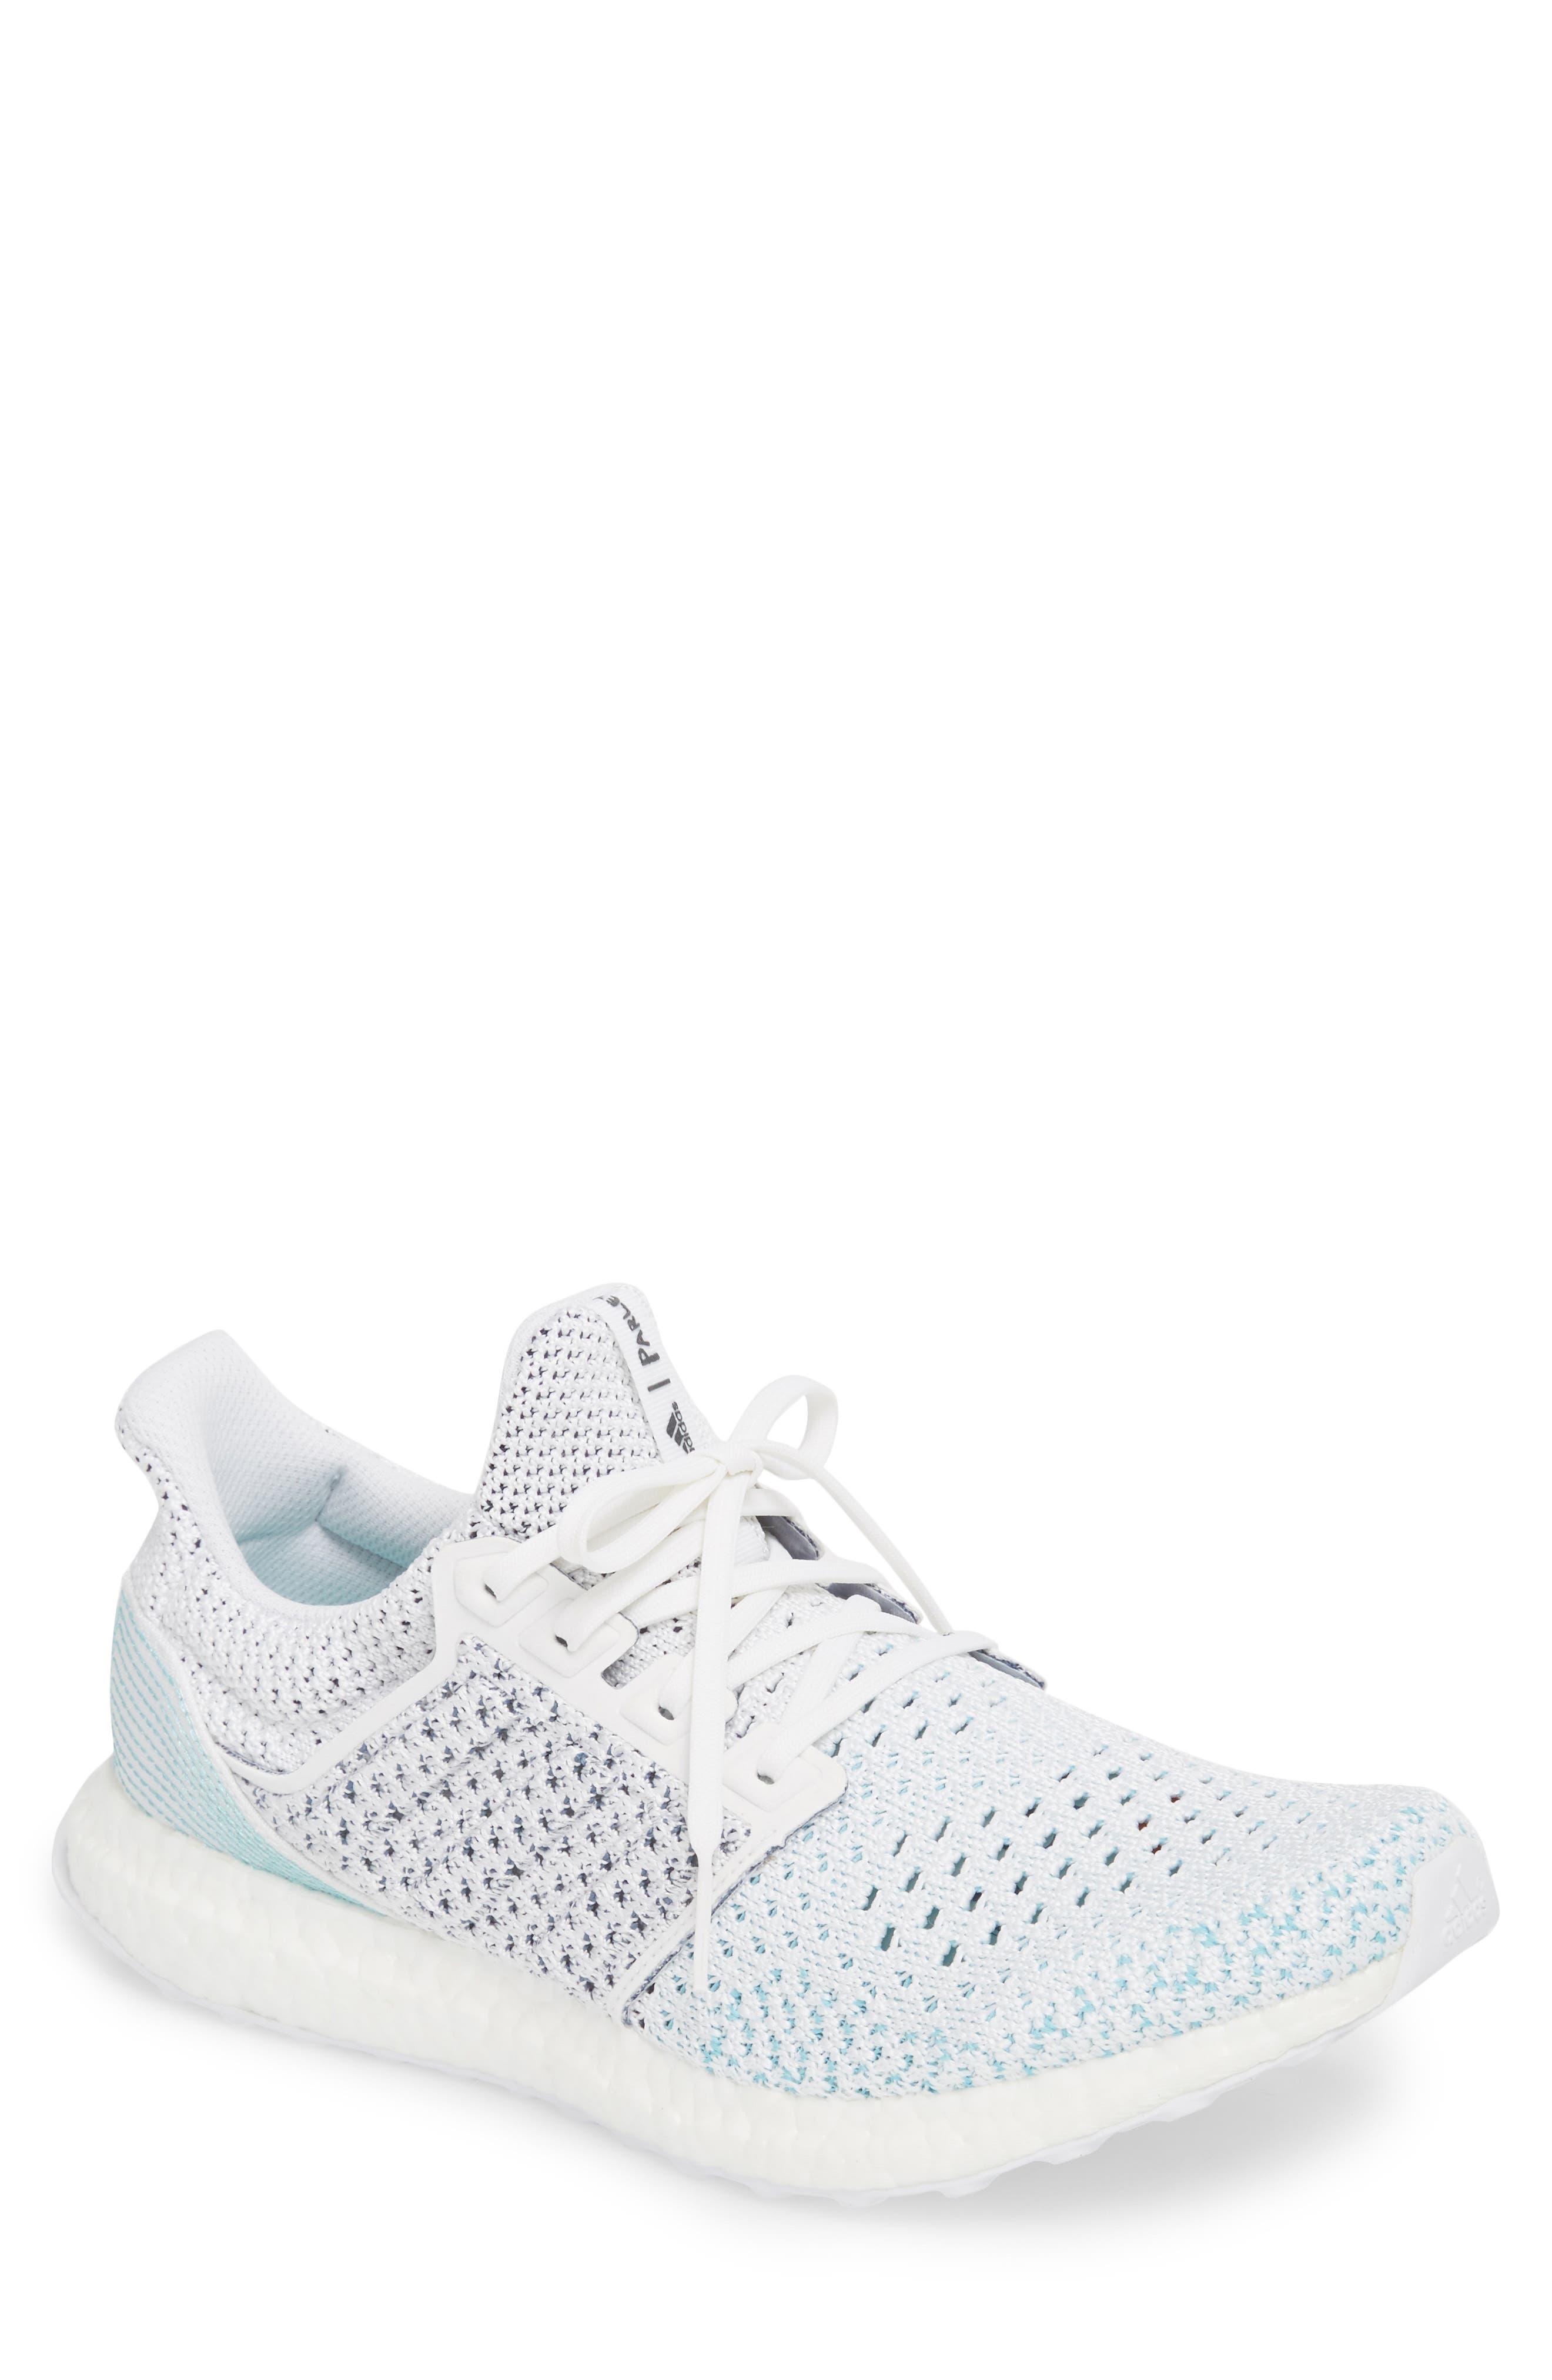 Parley UltraBoost Sneaker,                             Main thumbnail 1, color,                             WHITE/ BLUE SPIRIT